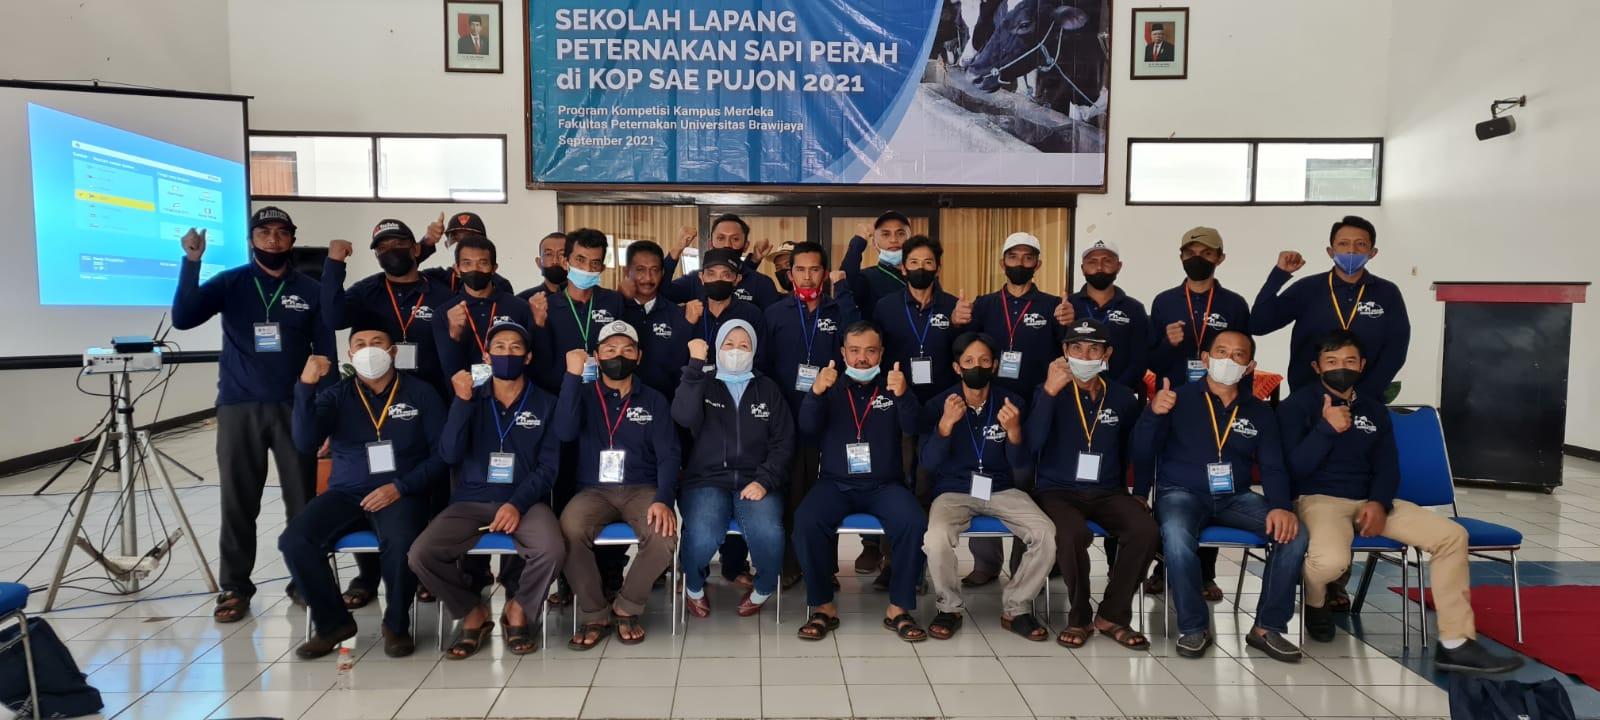 Community Service through Field School